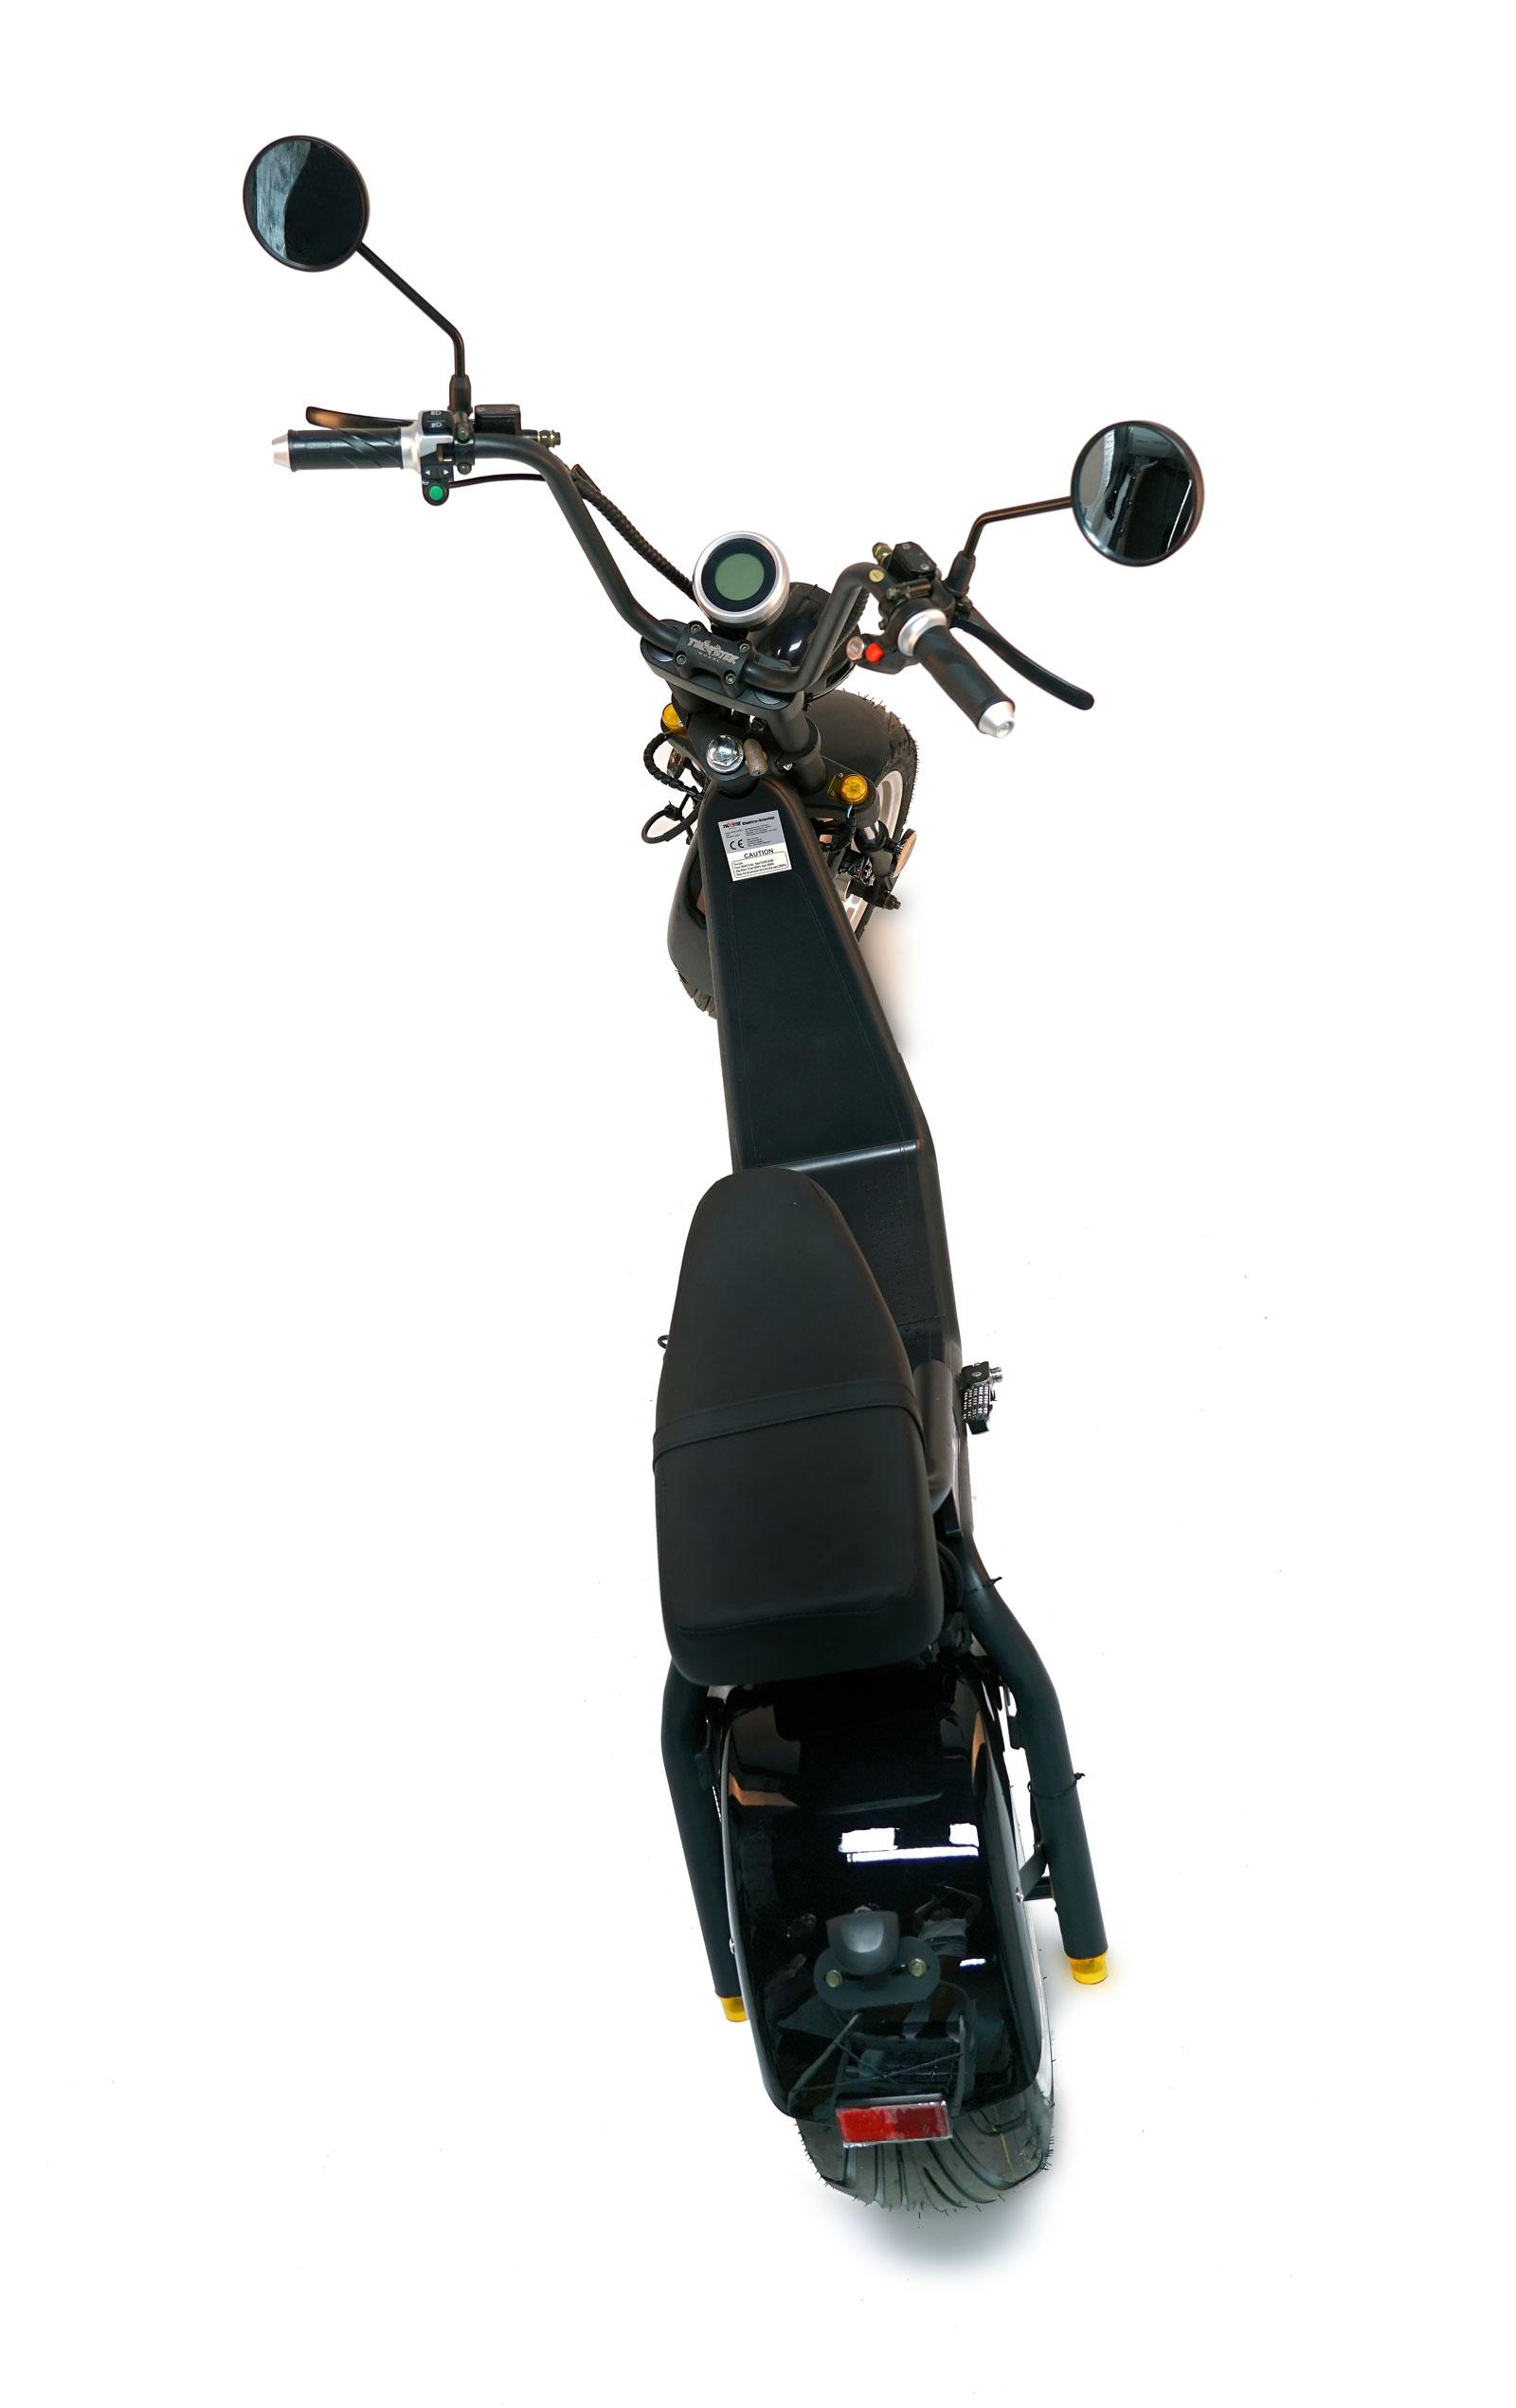 Citi Cruiser Elektro Scooter Chopper City-Scooter schwarz glänzend Bild 11